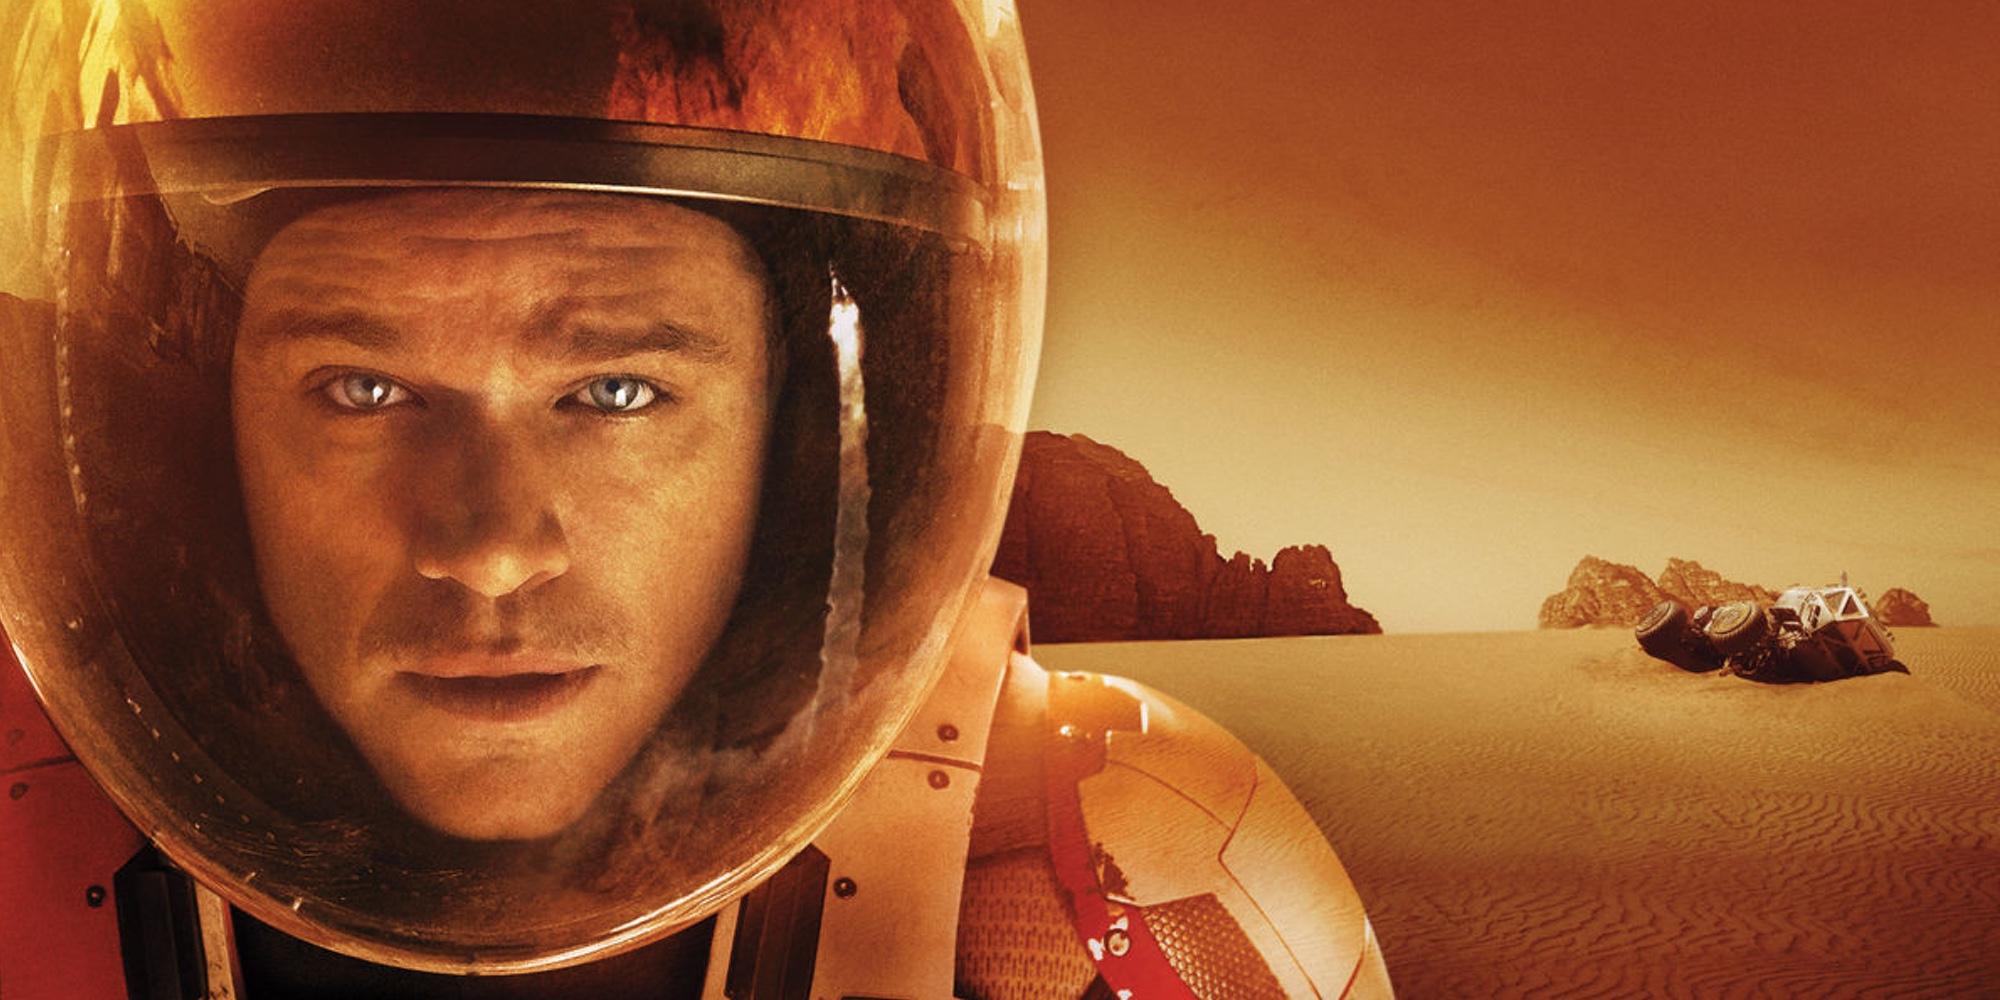 VUDU Mix & Match 4K for $10: The Martian, Logan, Mrs. Doubtfire, Life of Pi, more